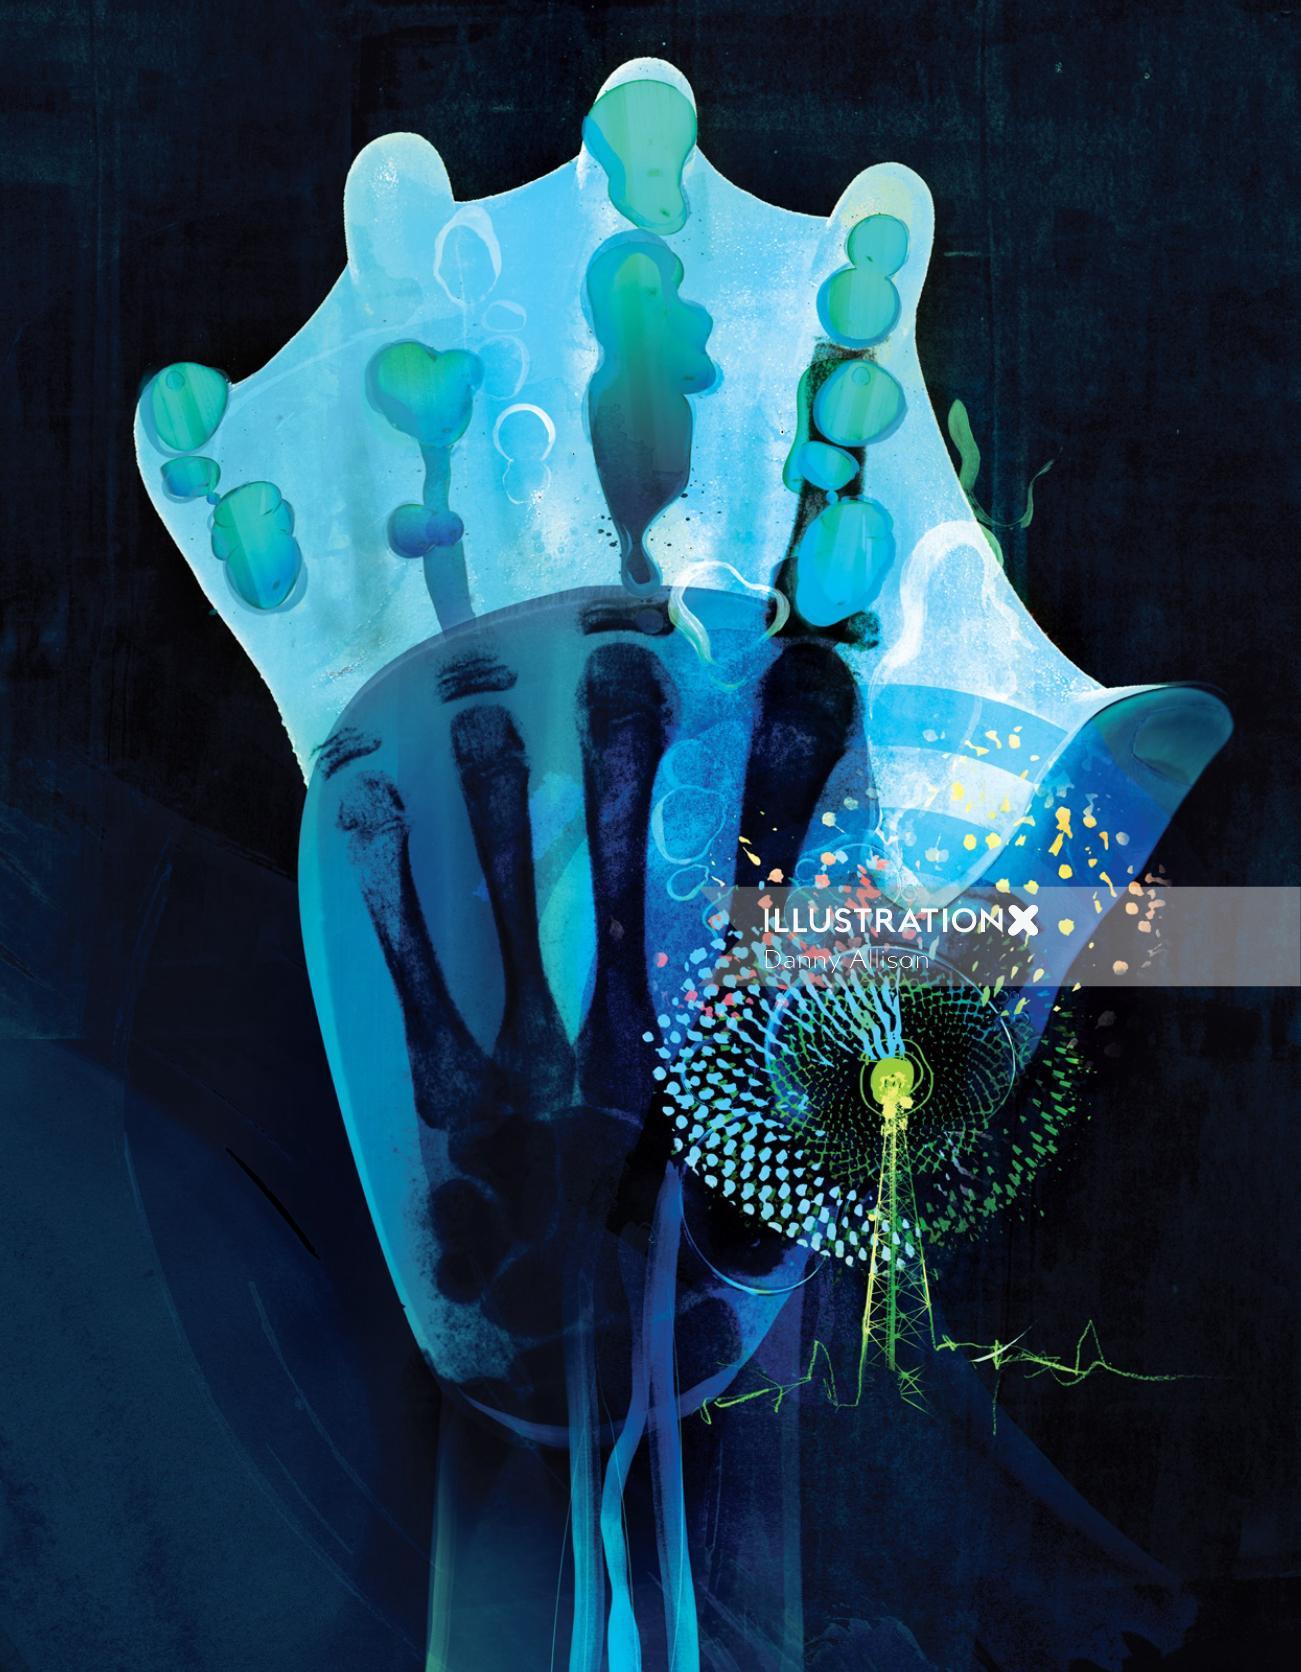 Medical hand xray